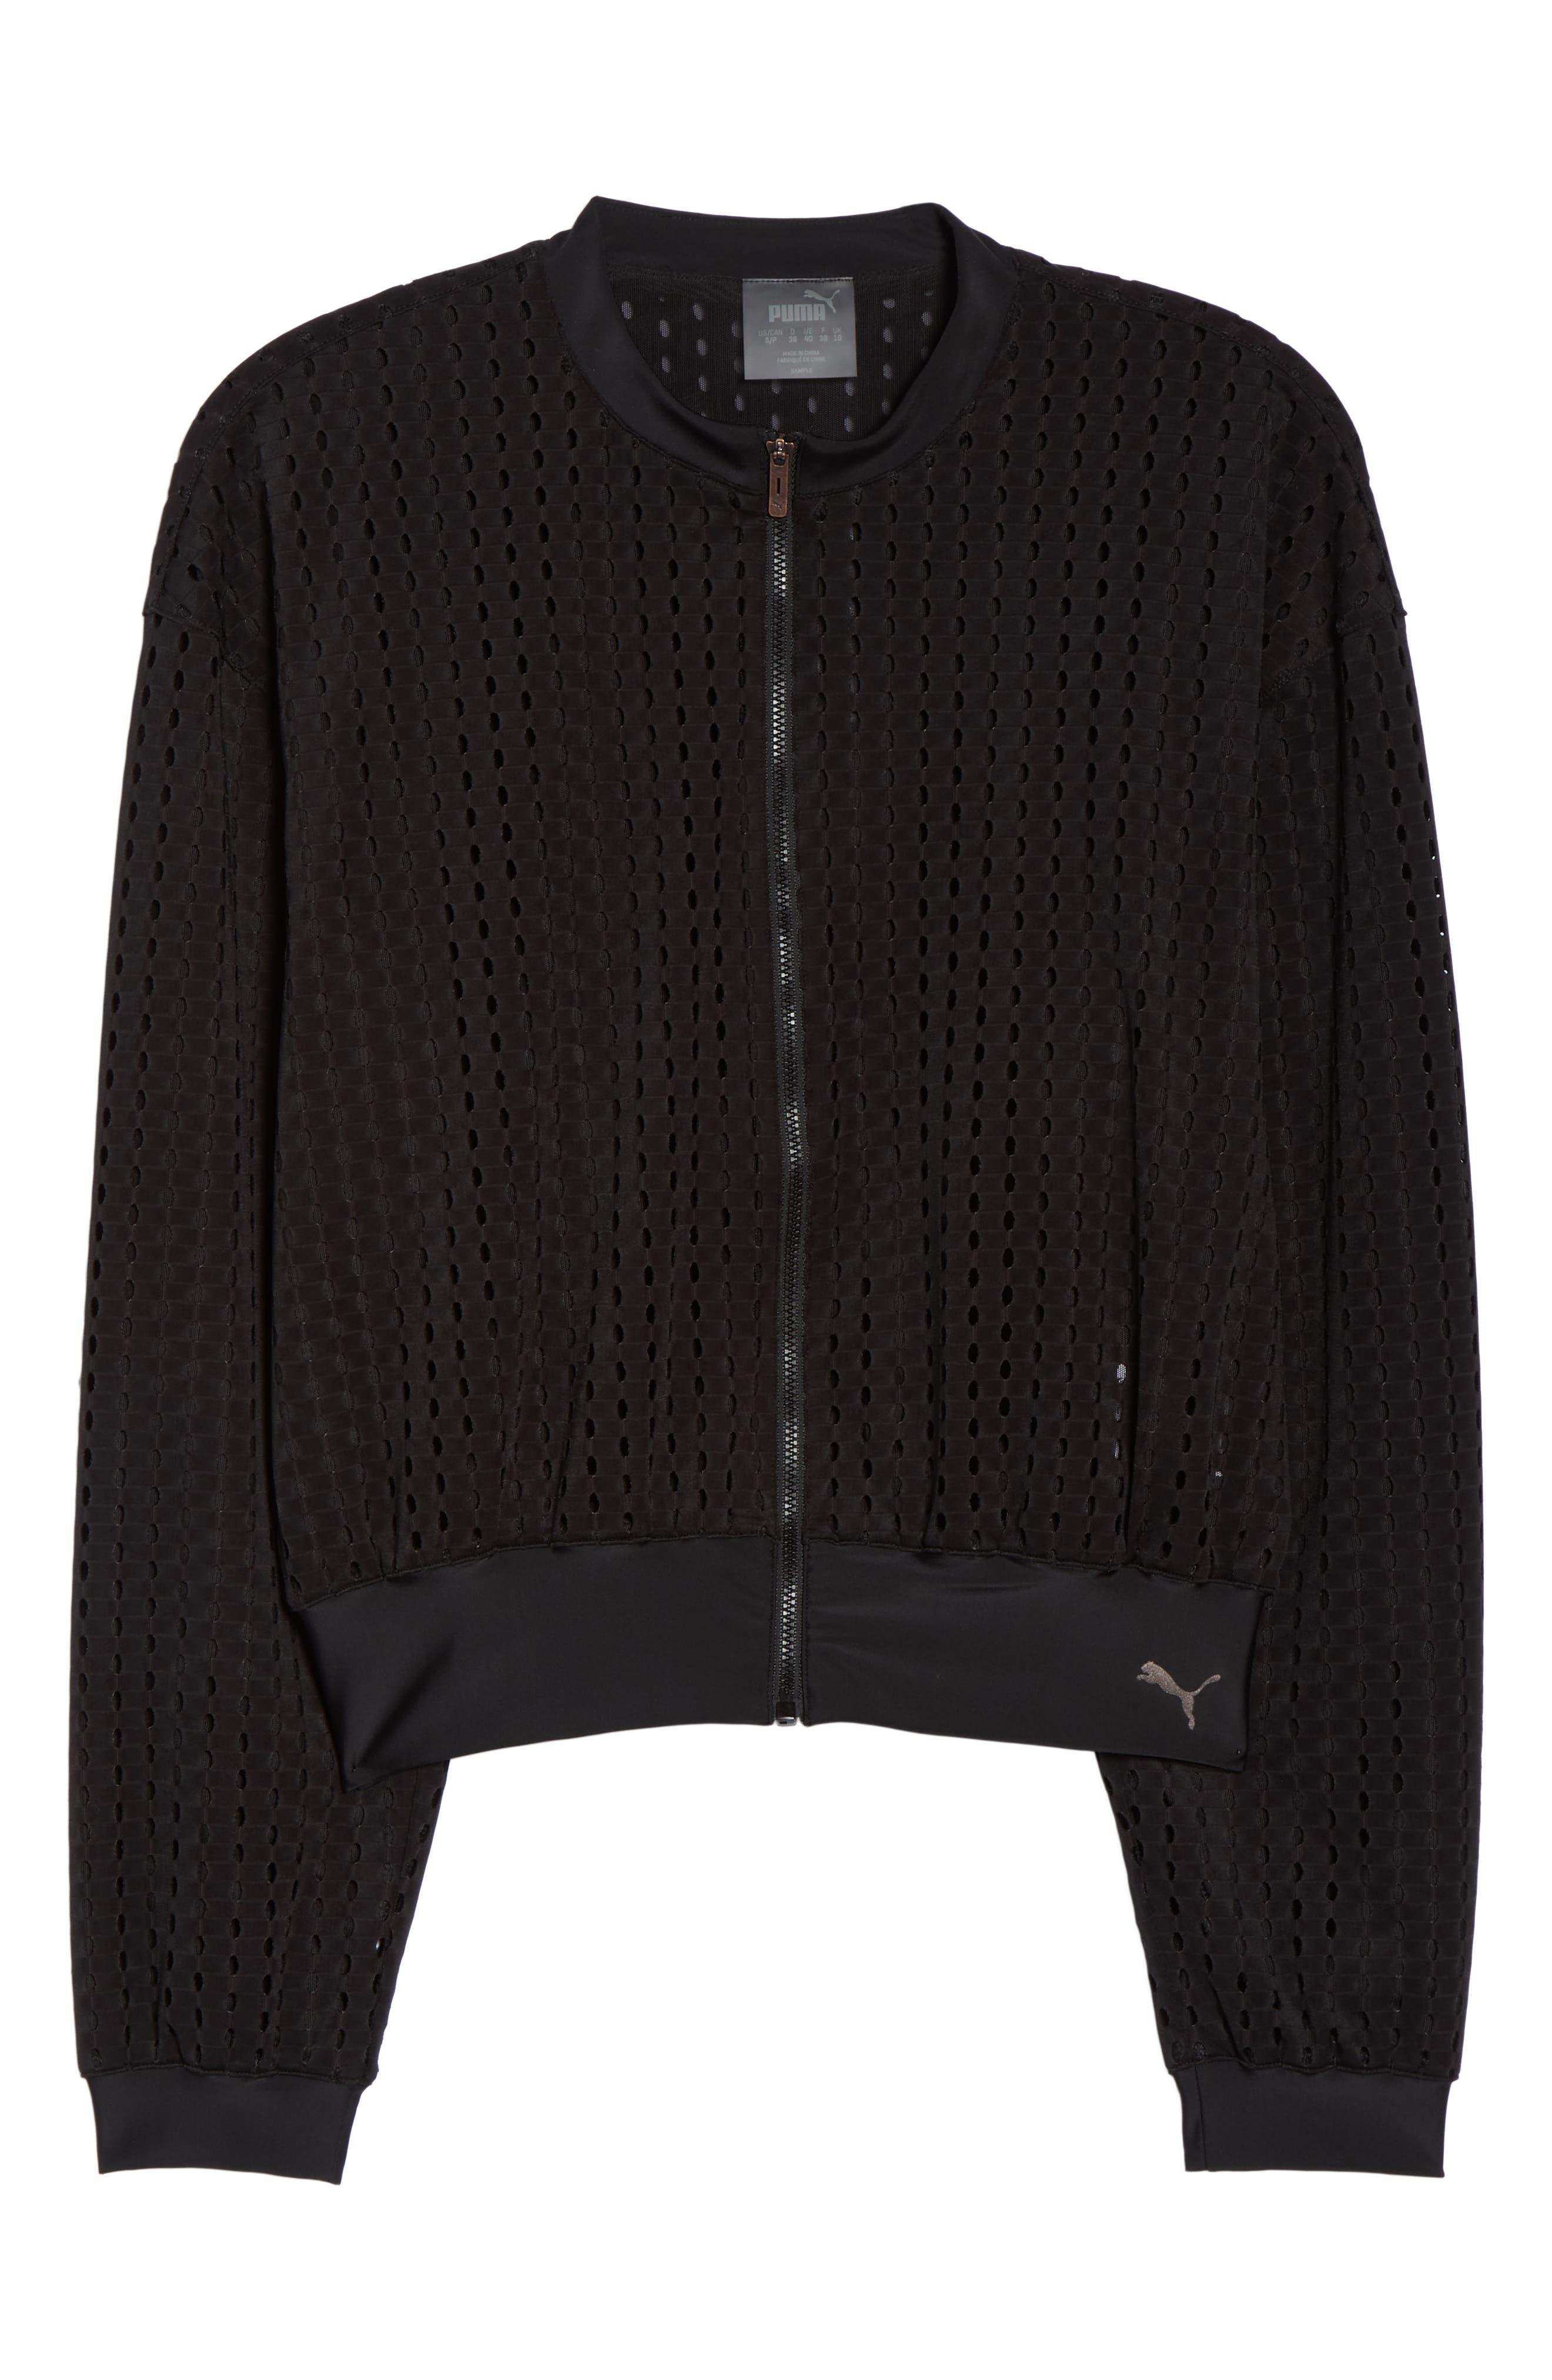 Luxe Jacket,                             Alternate thumbnail 7, color,                             PUMA BLACK